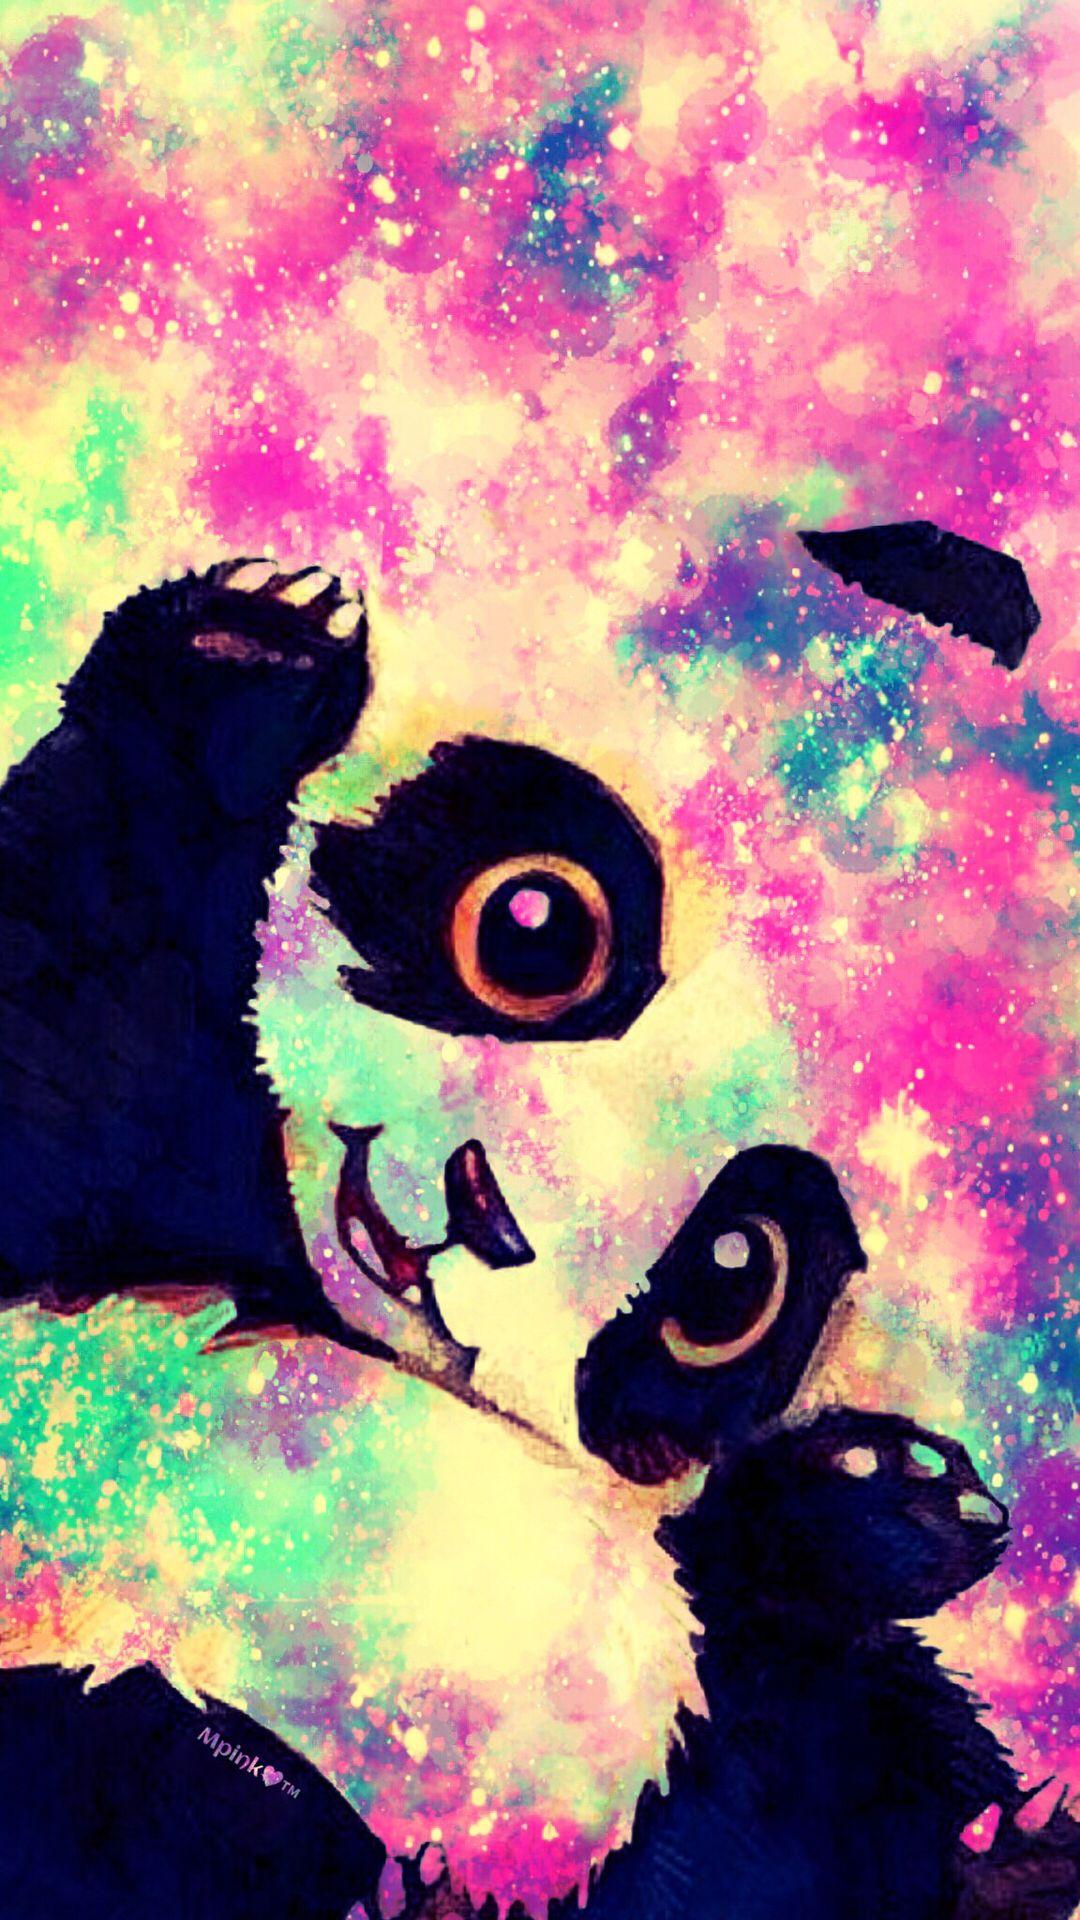 Wallpapers Fofo Cutes Cute Panda Galaxy Wallpaper Androidwallpaper